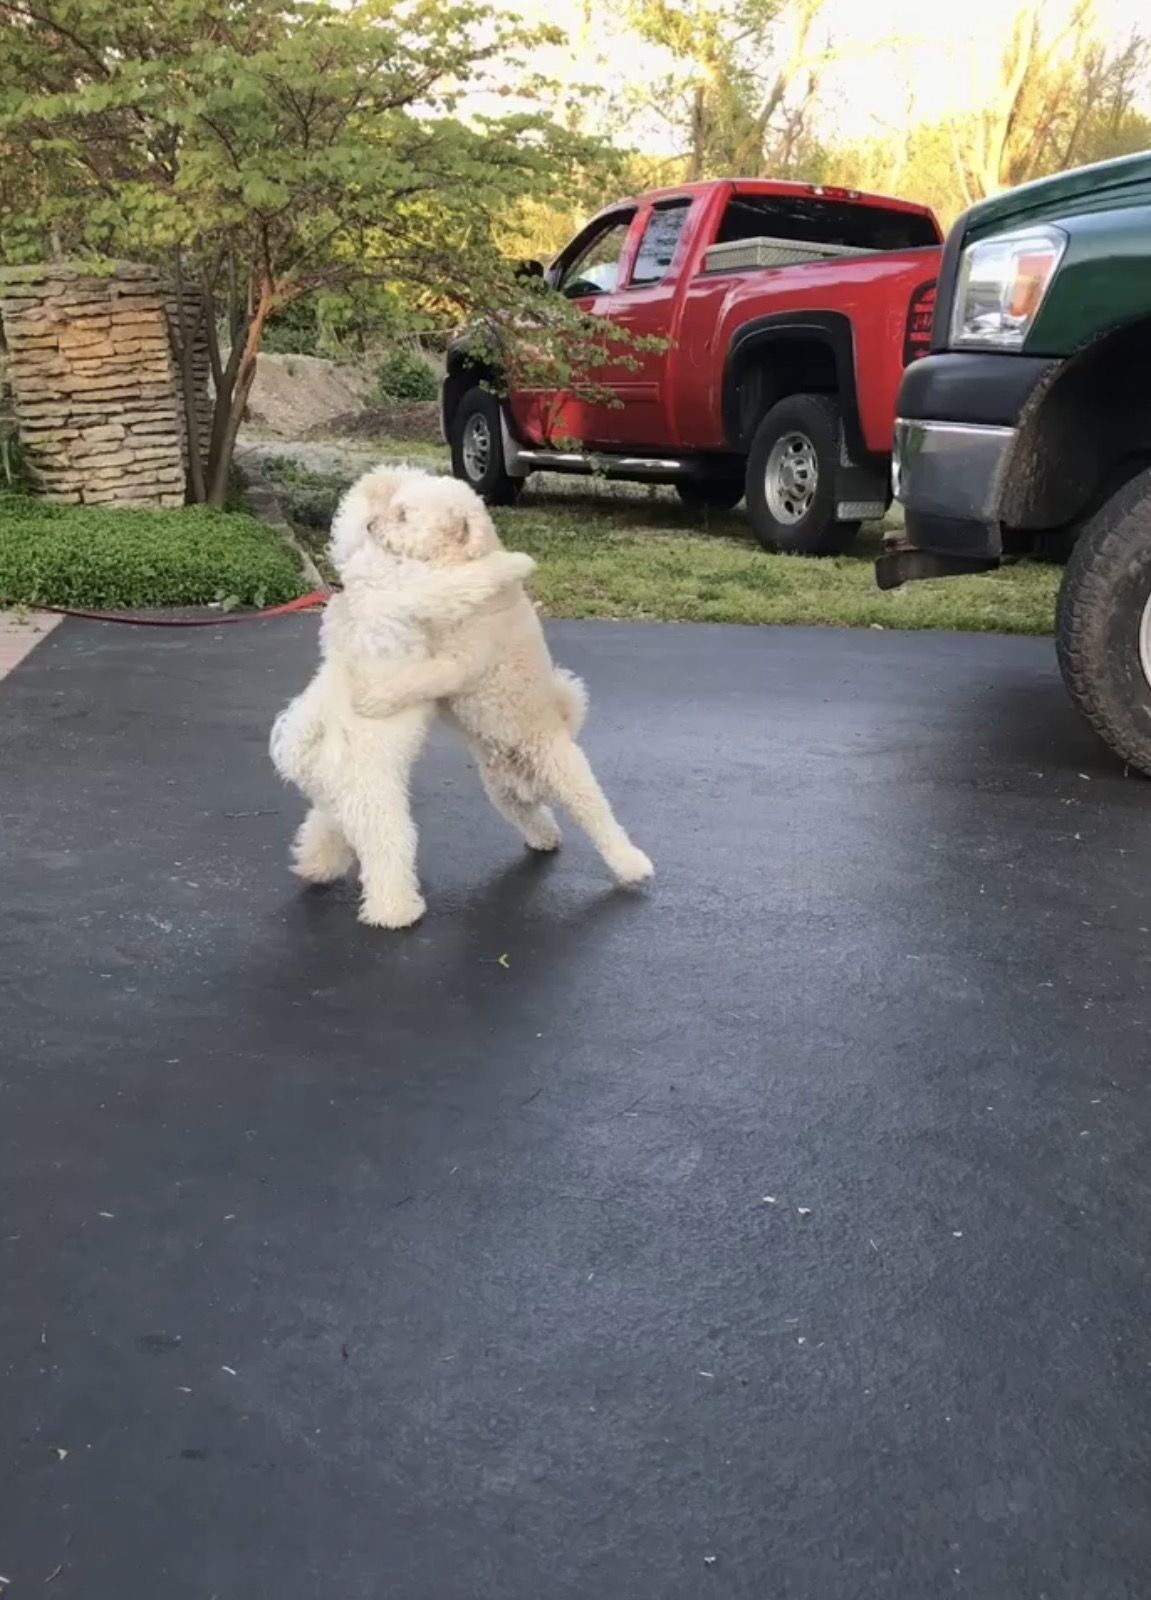 My dog giving his half brother a hug http://ift.tt/2qkymTg